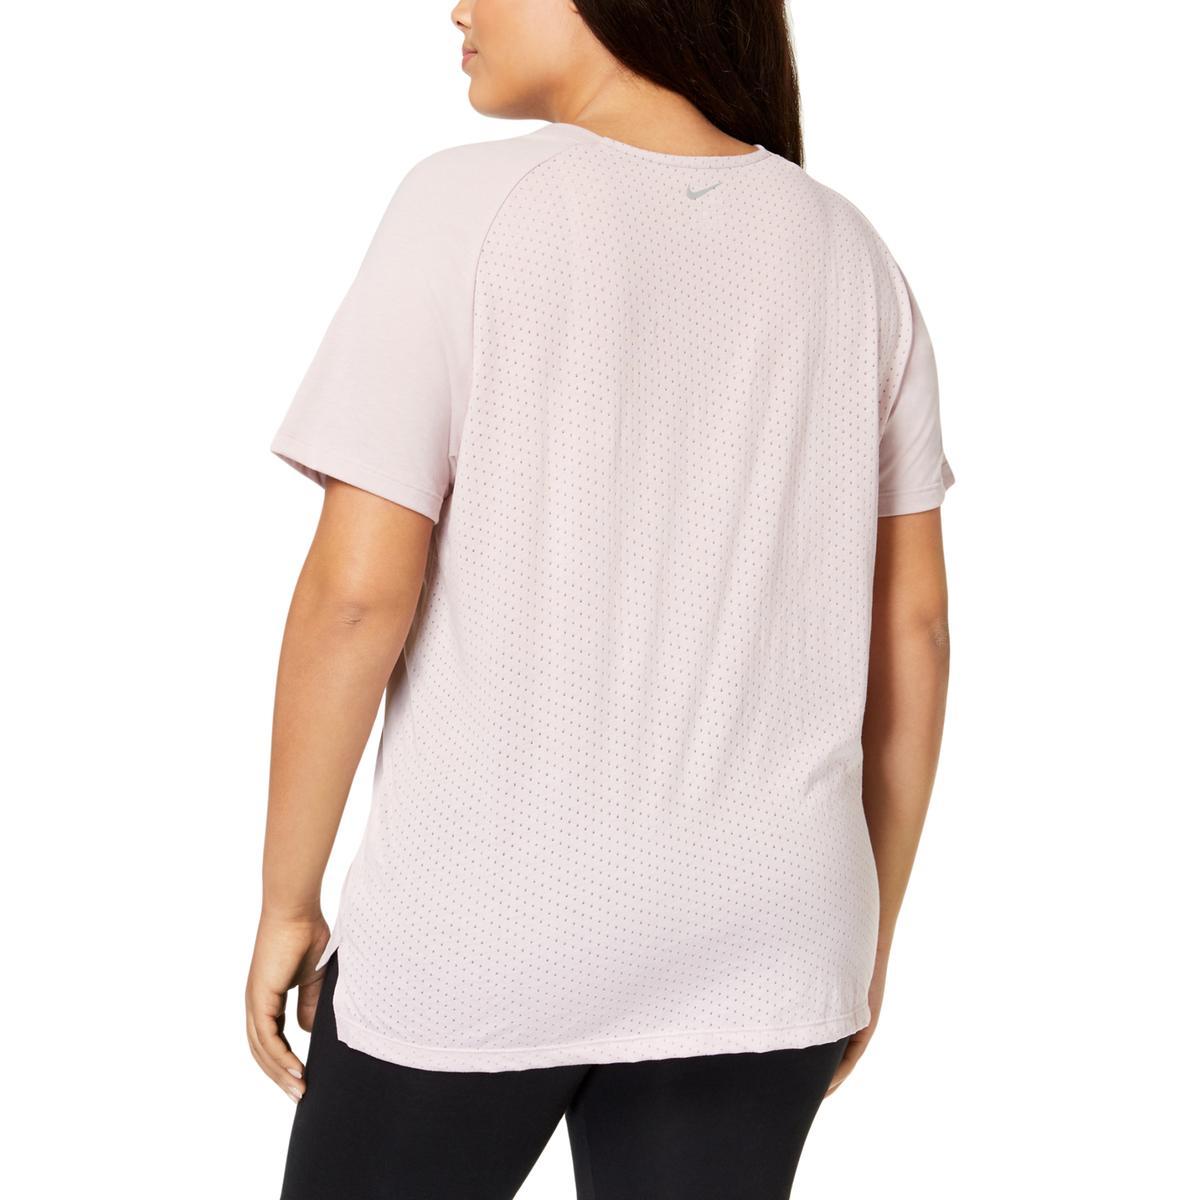 2afa121d1e4f82 Nike Womens Breathable Dri-Fit Active Wear Pullover Top Shirt Plus ...